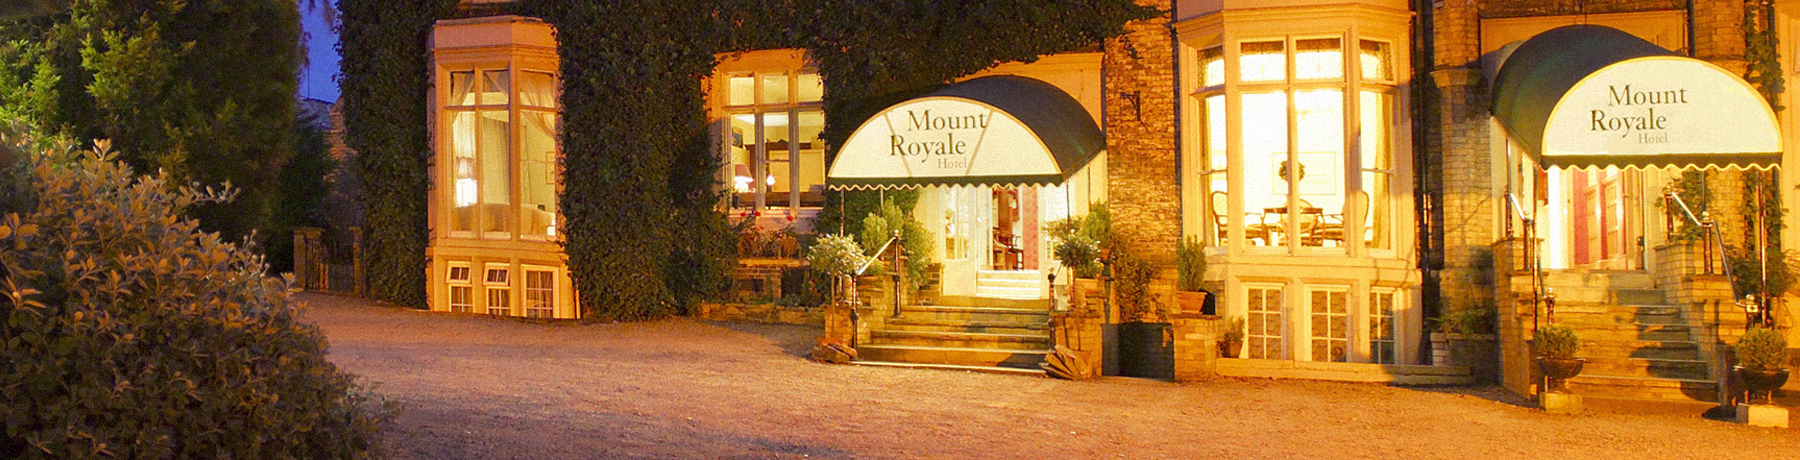 Mount Royale Restaurant York